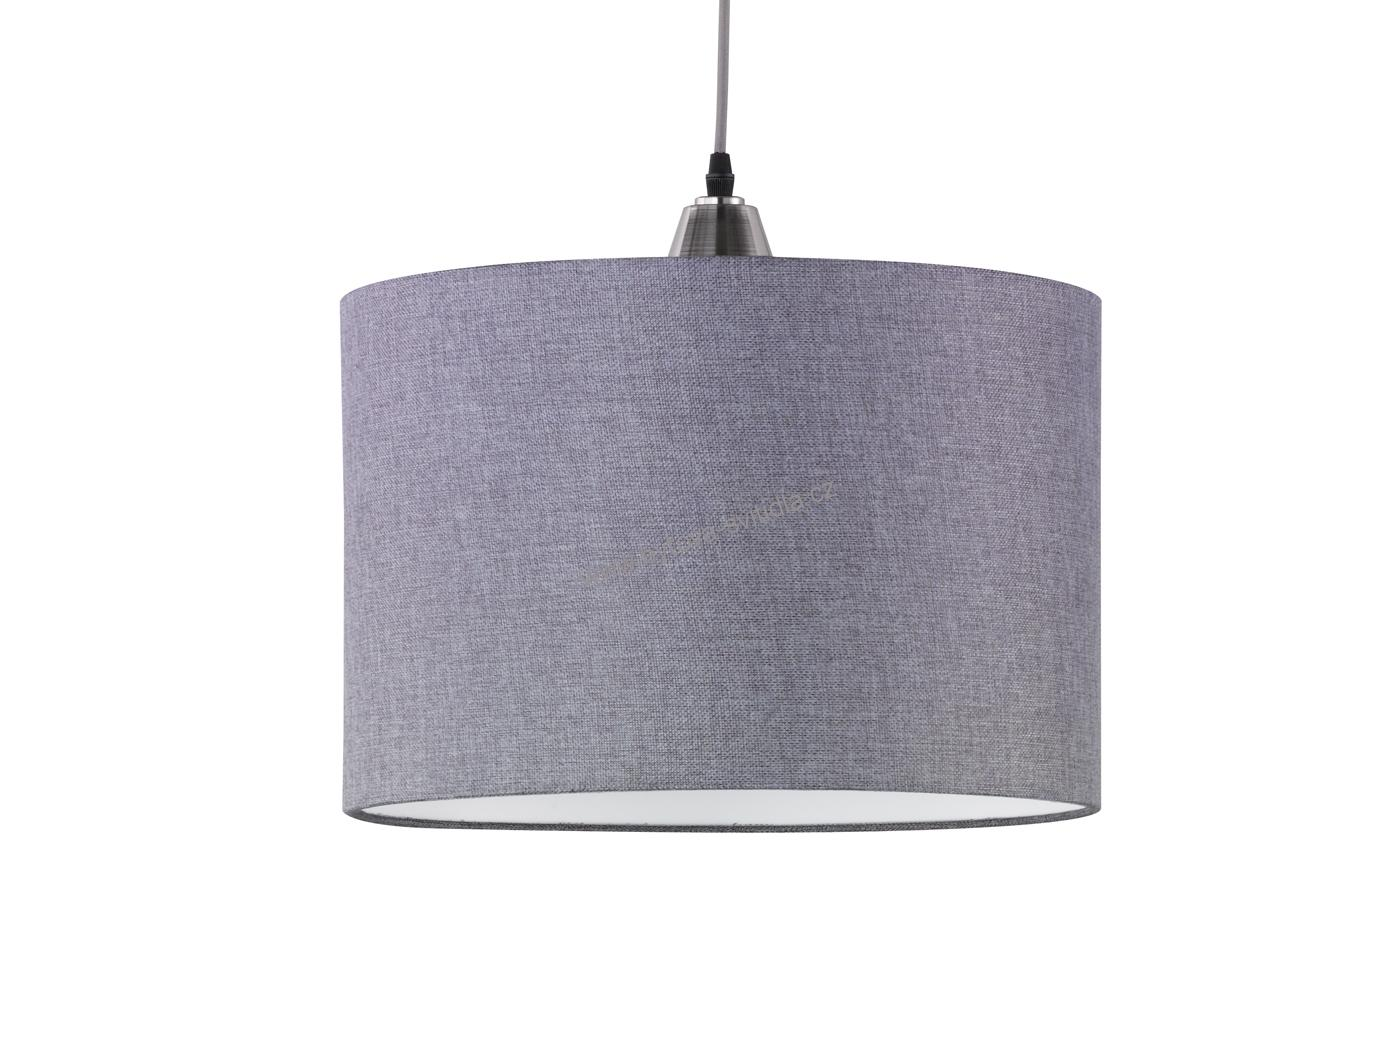 trio 306500107 cosinus modern textiln lustr ed 40cm. Black Bedroom Furniture Sets. Home Design Ideas